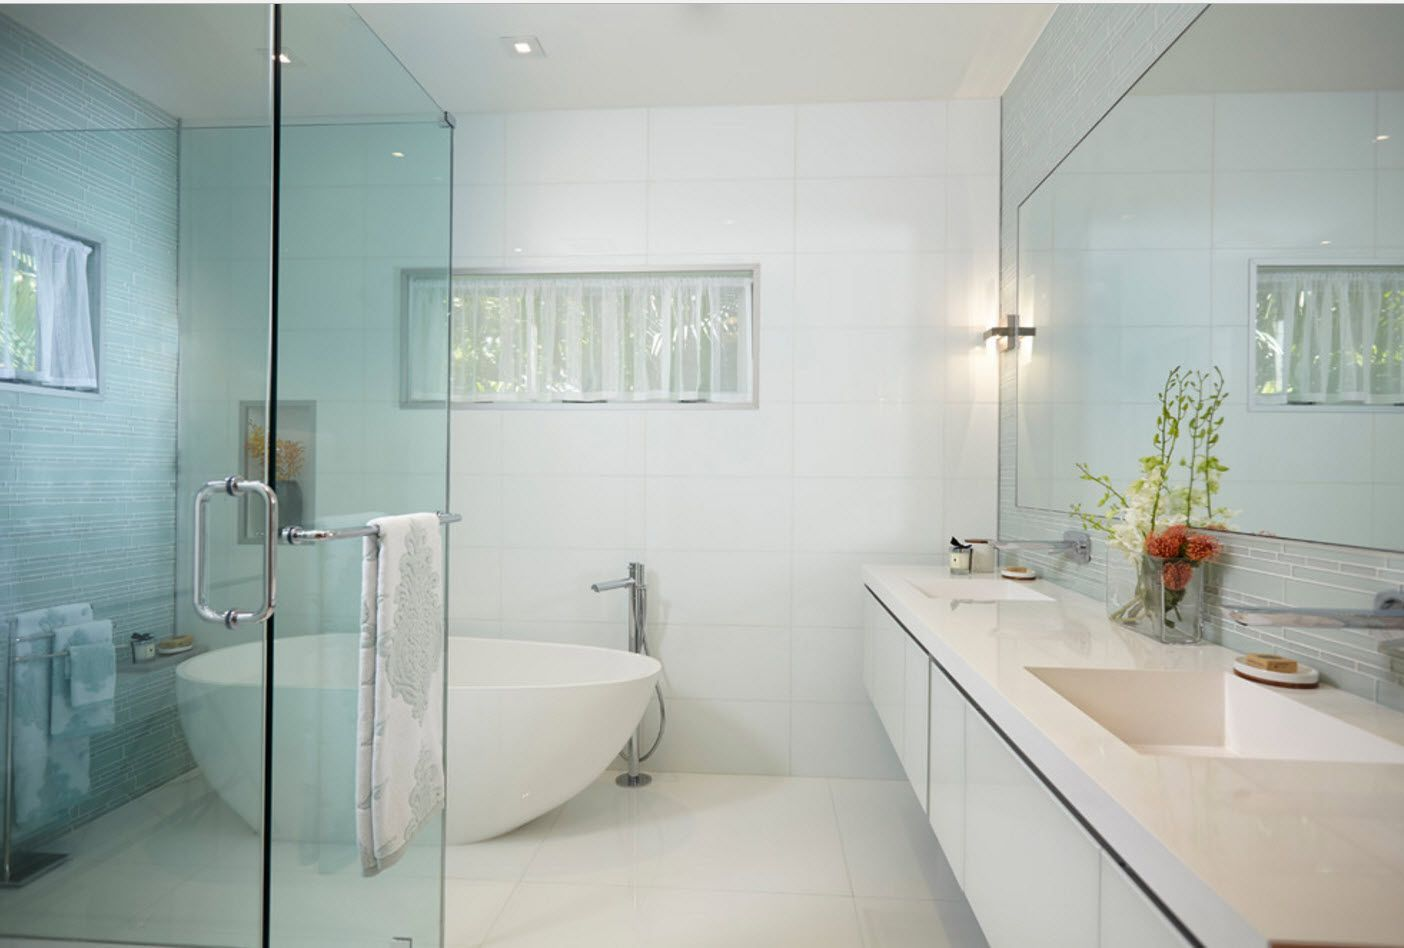 Bathroom Design Trends & Decoration Ideas 2017 snow white finish and oval form of bathtub